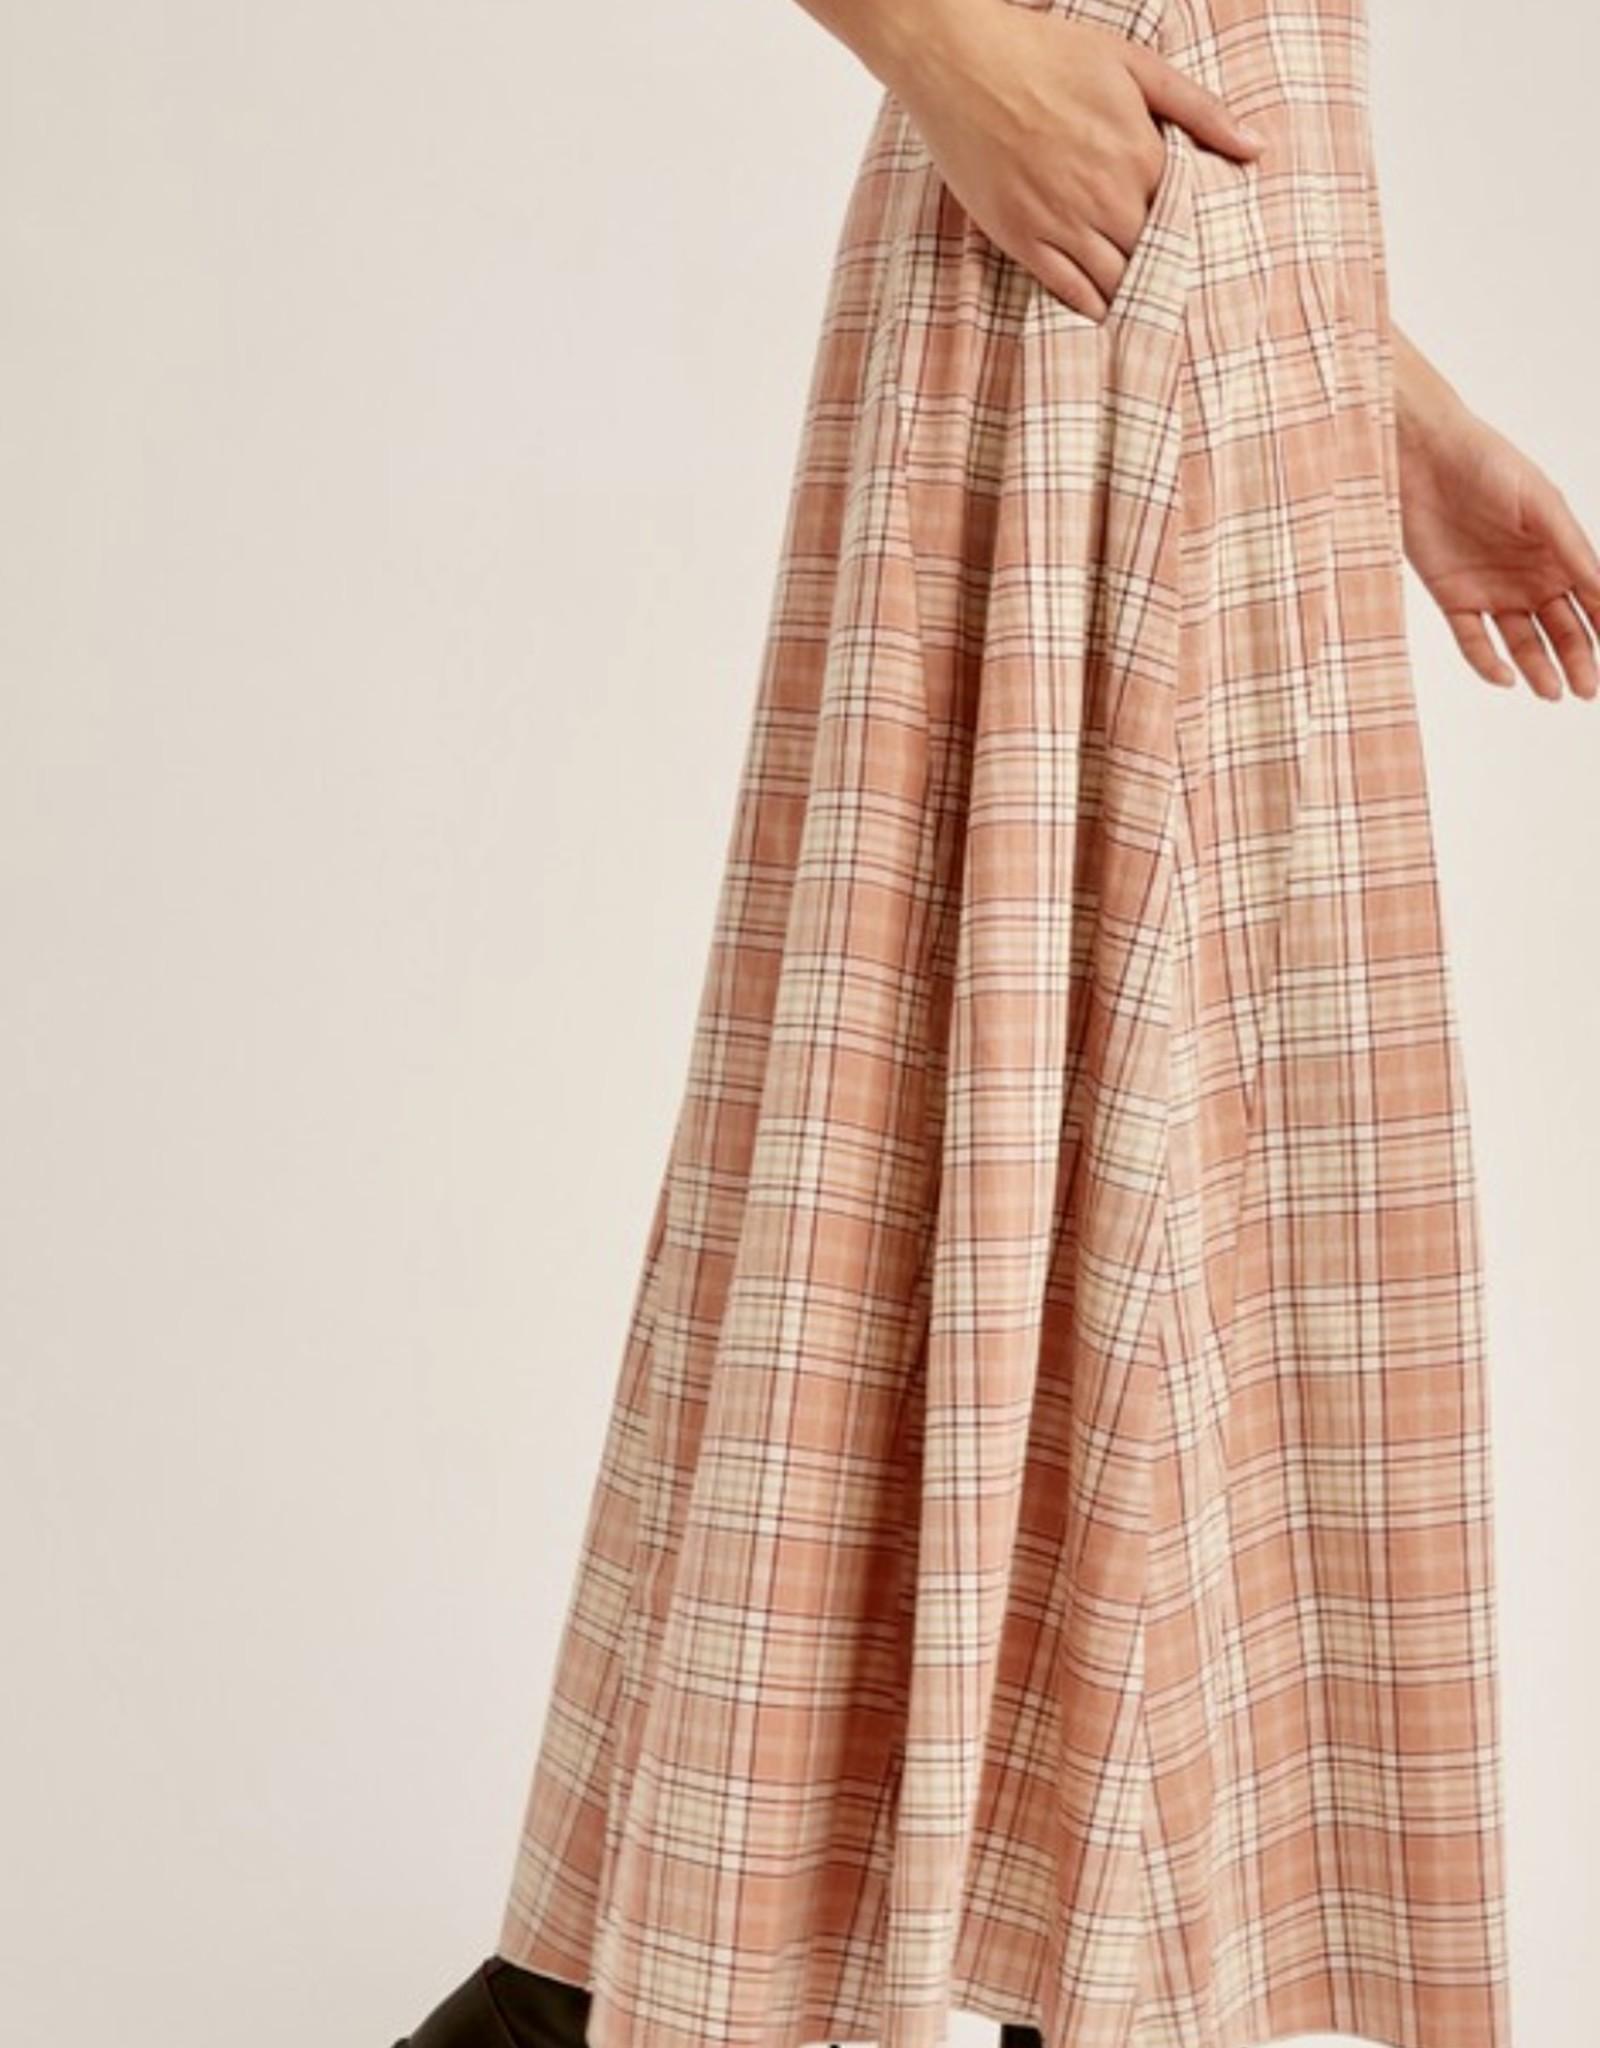 HUSH AUBREY plaid maxi skirt